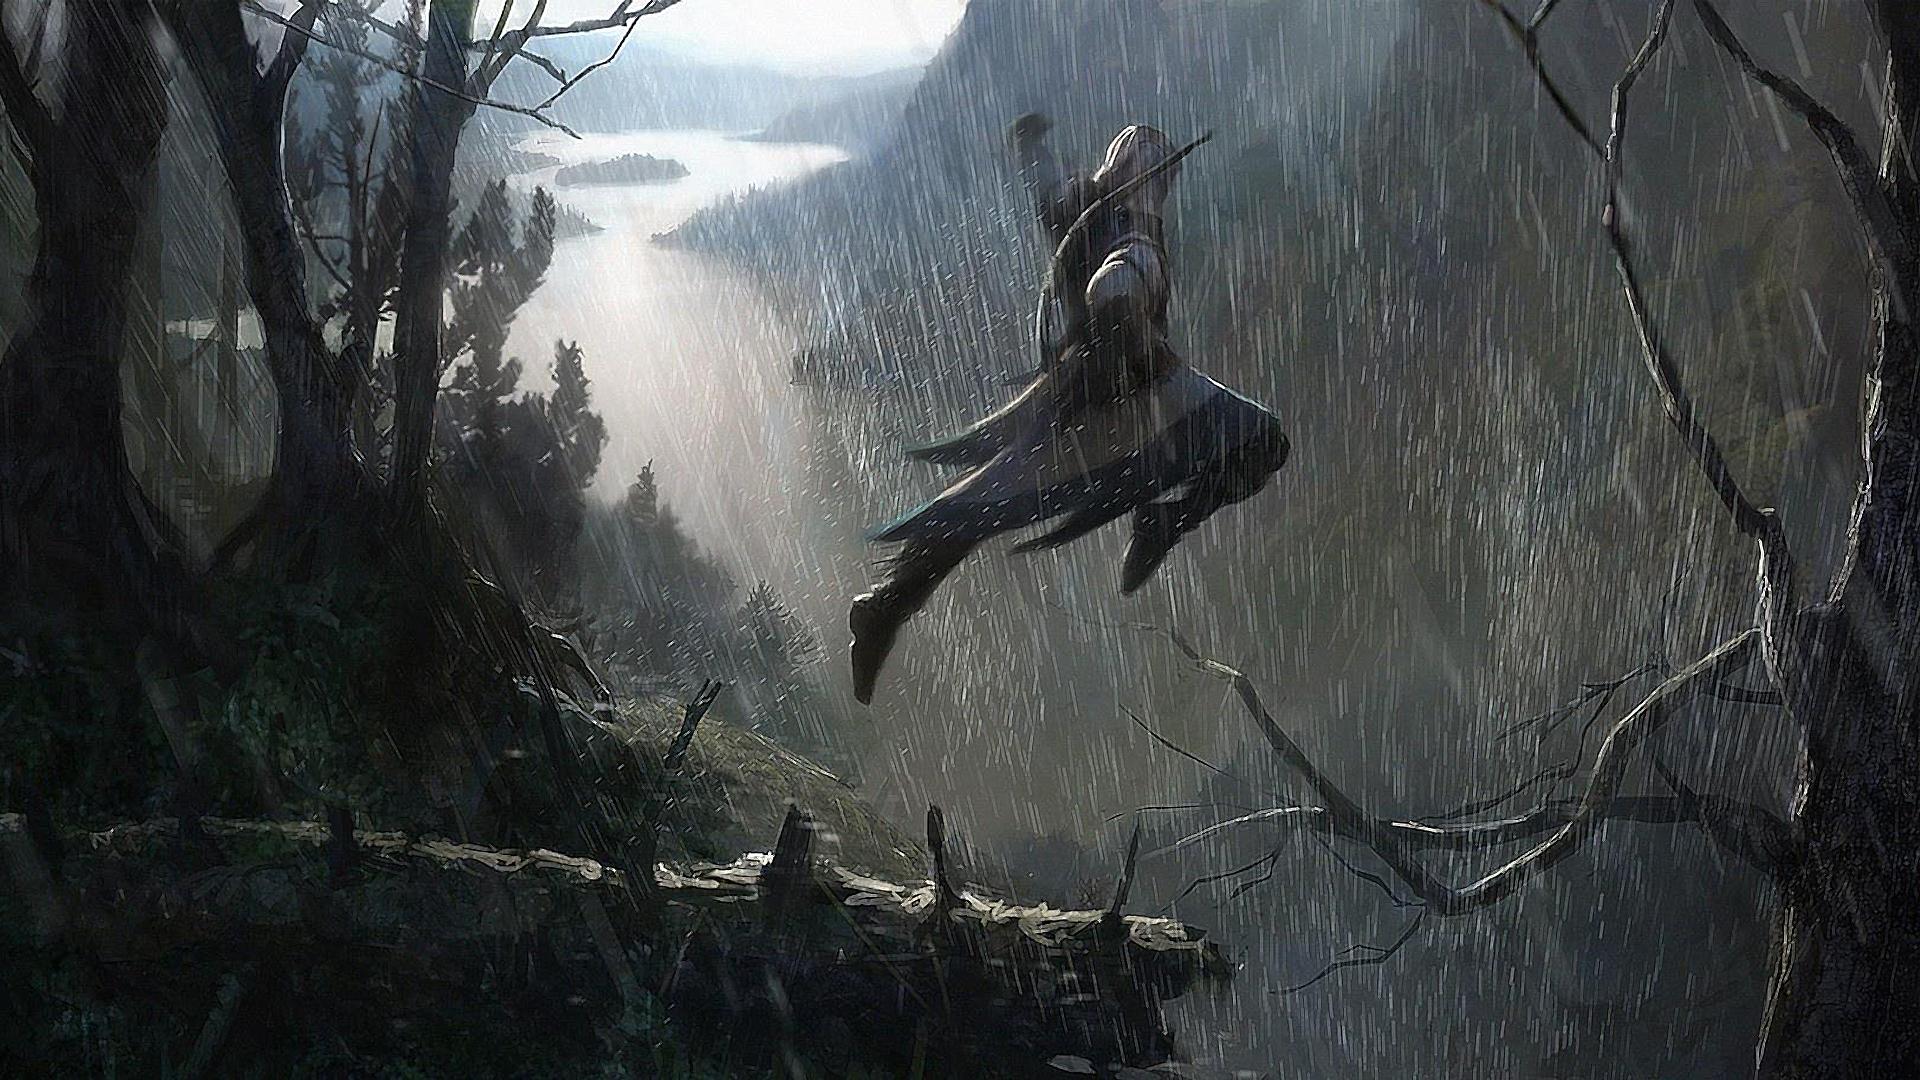 la coleccin Assassins Creed Videojuego Assassins Creed III 321171 1920x1080